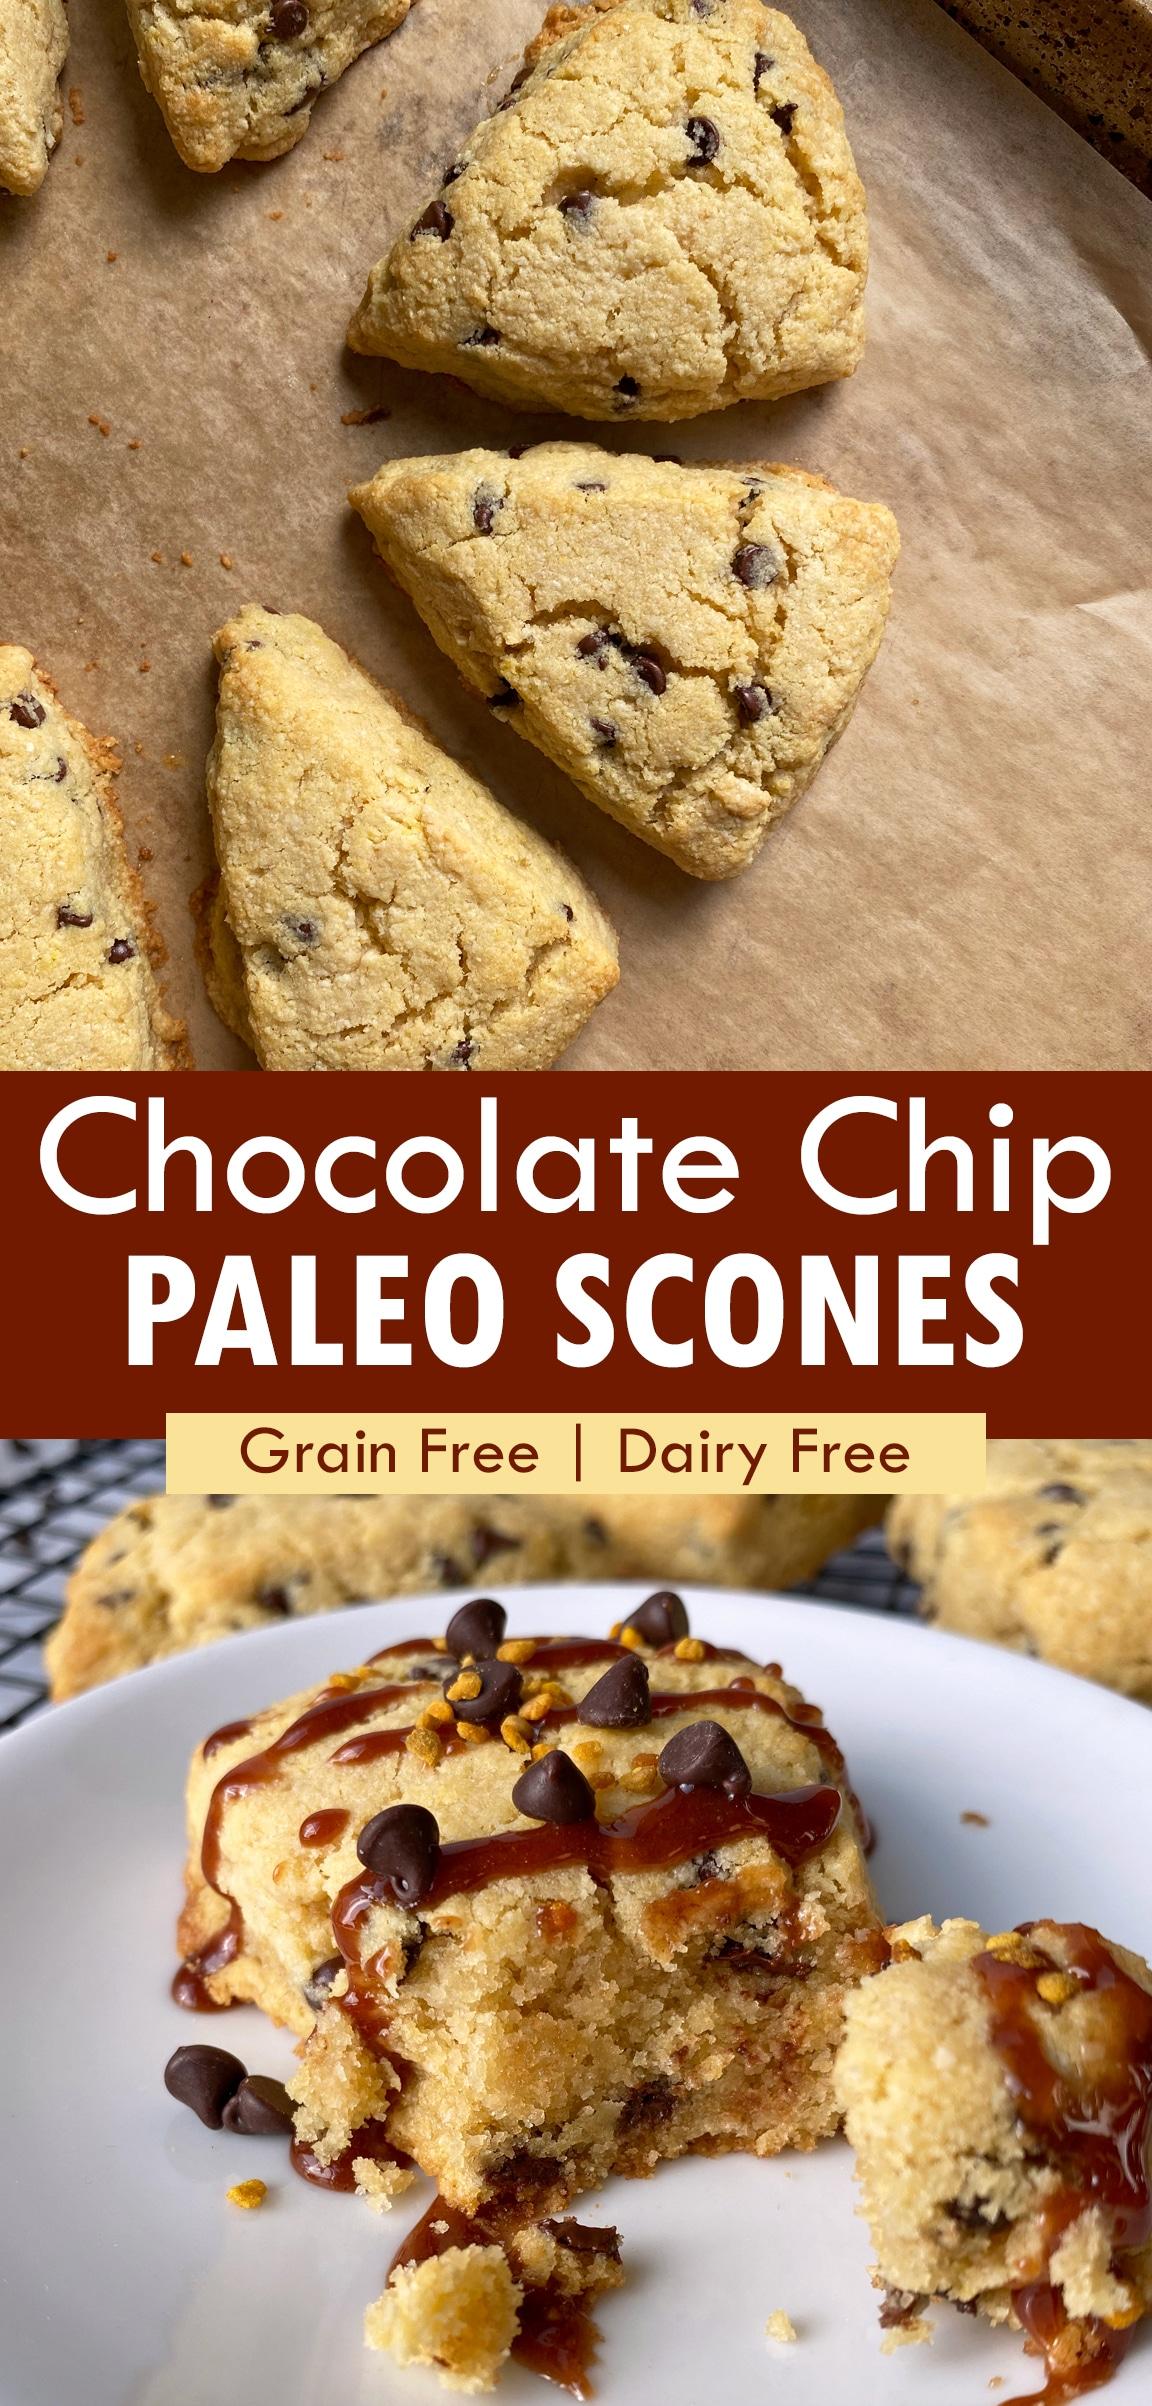 chocolate-chip-paleo-scone-recipe-pinterest-image